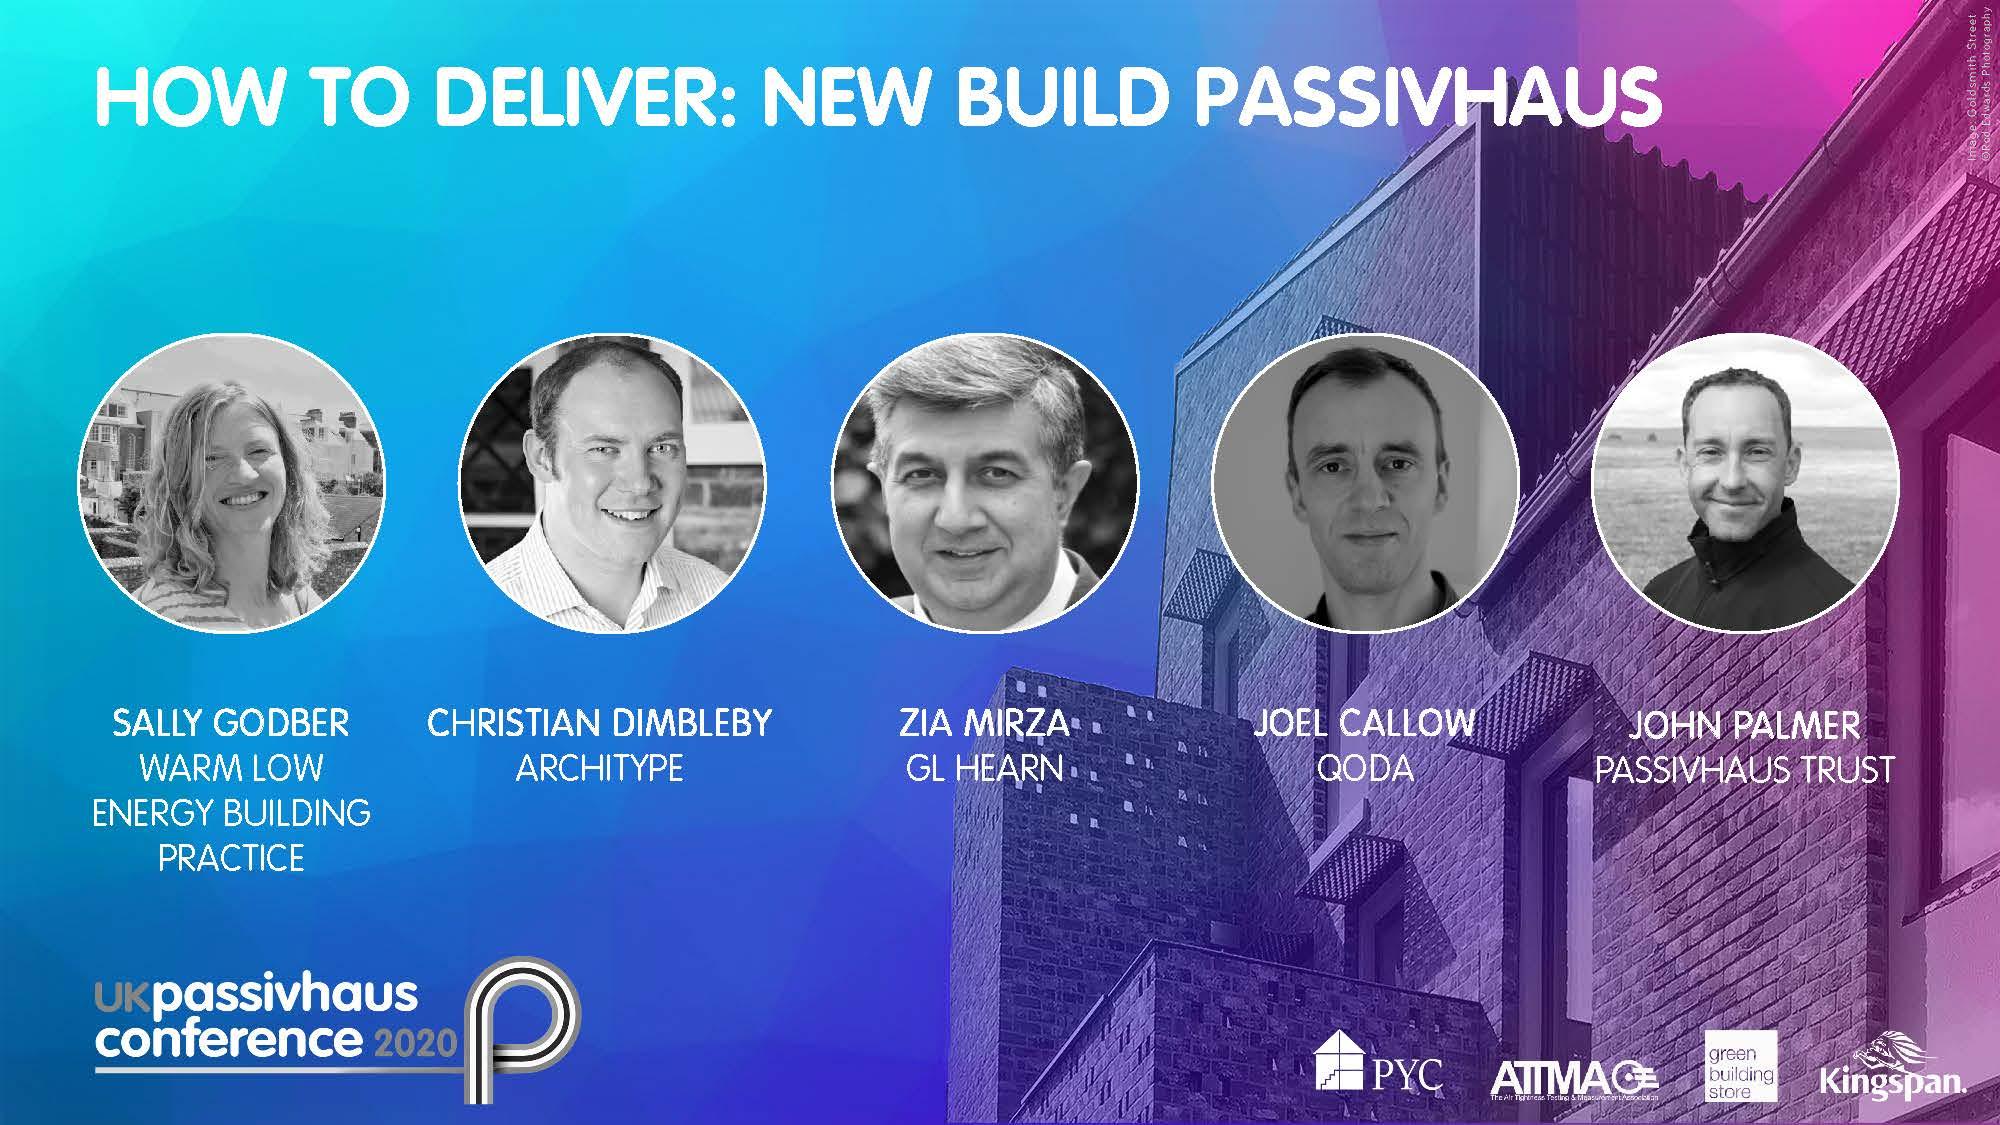 2020 UK Passivhaus Conference: How to deliver newbuild Passivhaus